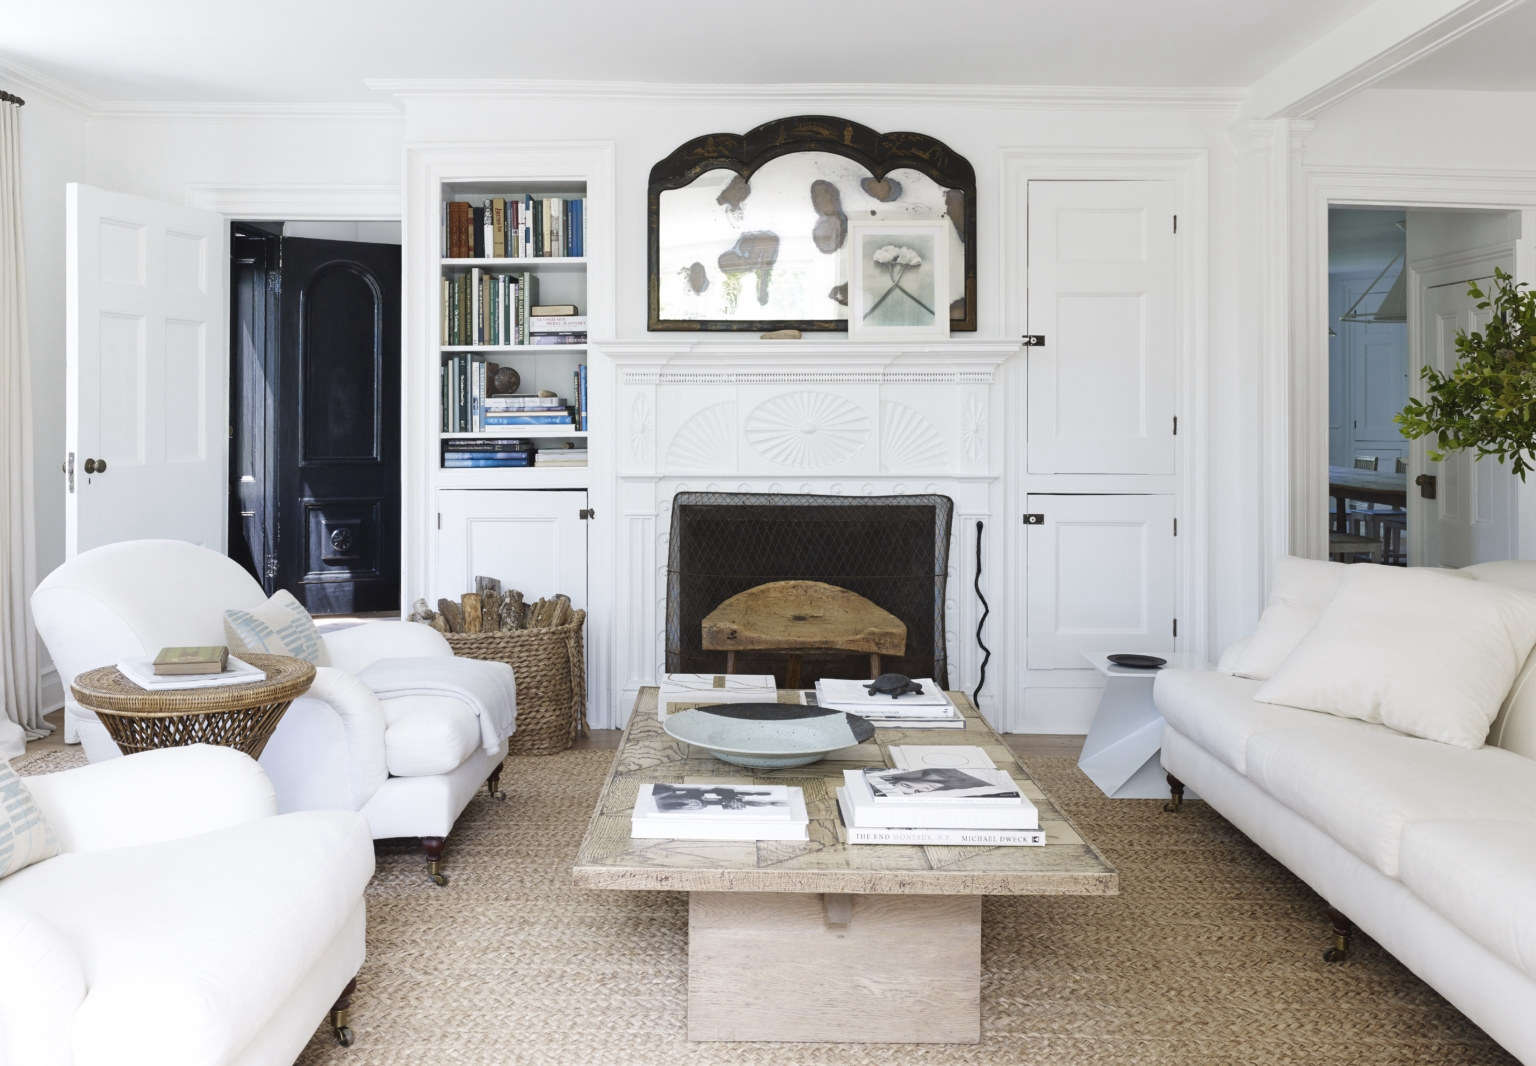 mona nerenberg lisa bynon hamptons house mark cunningham interior design 3